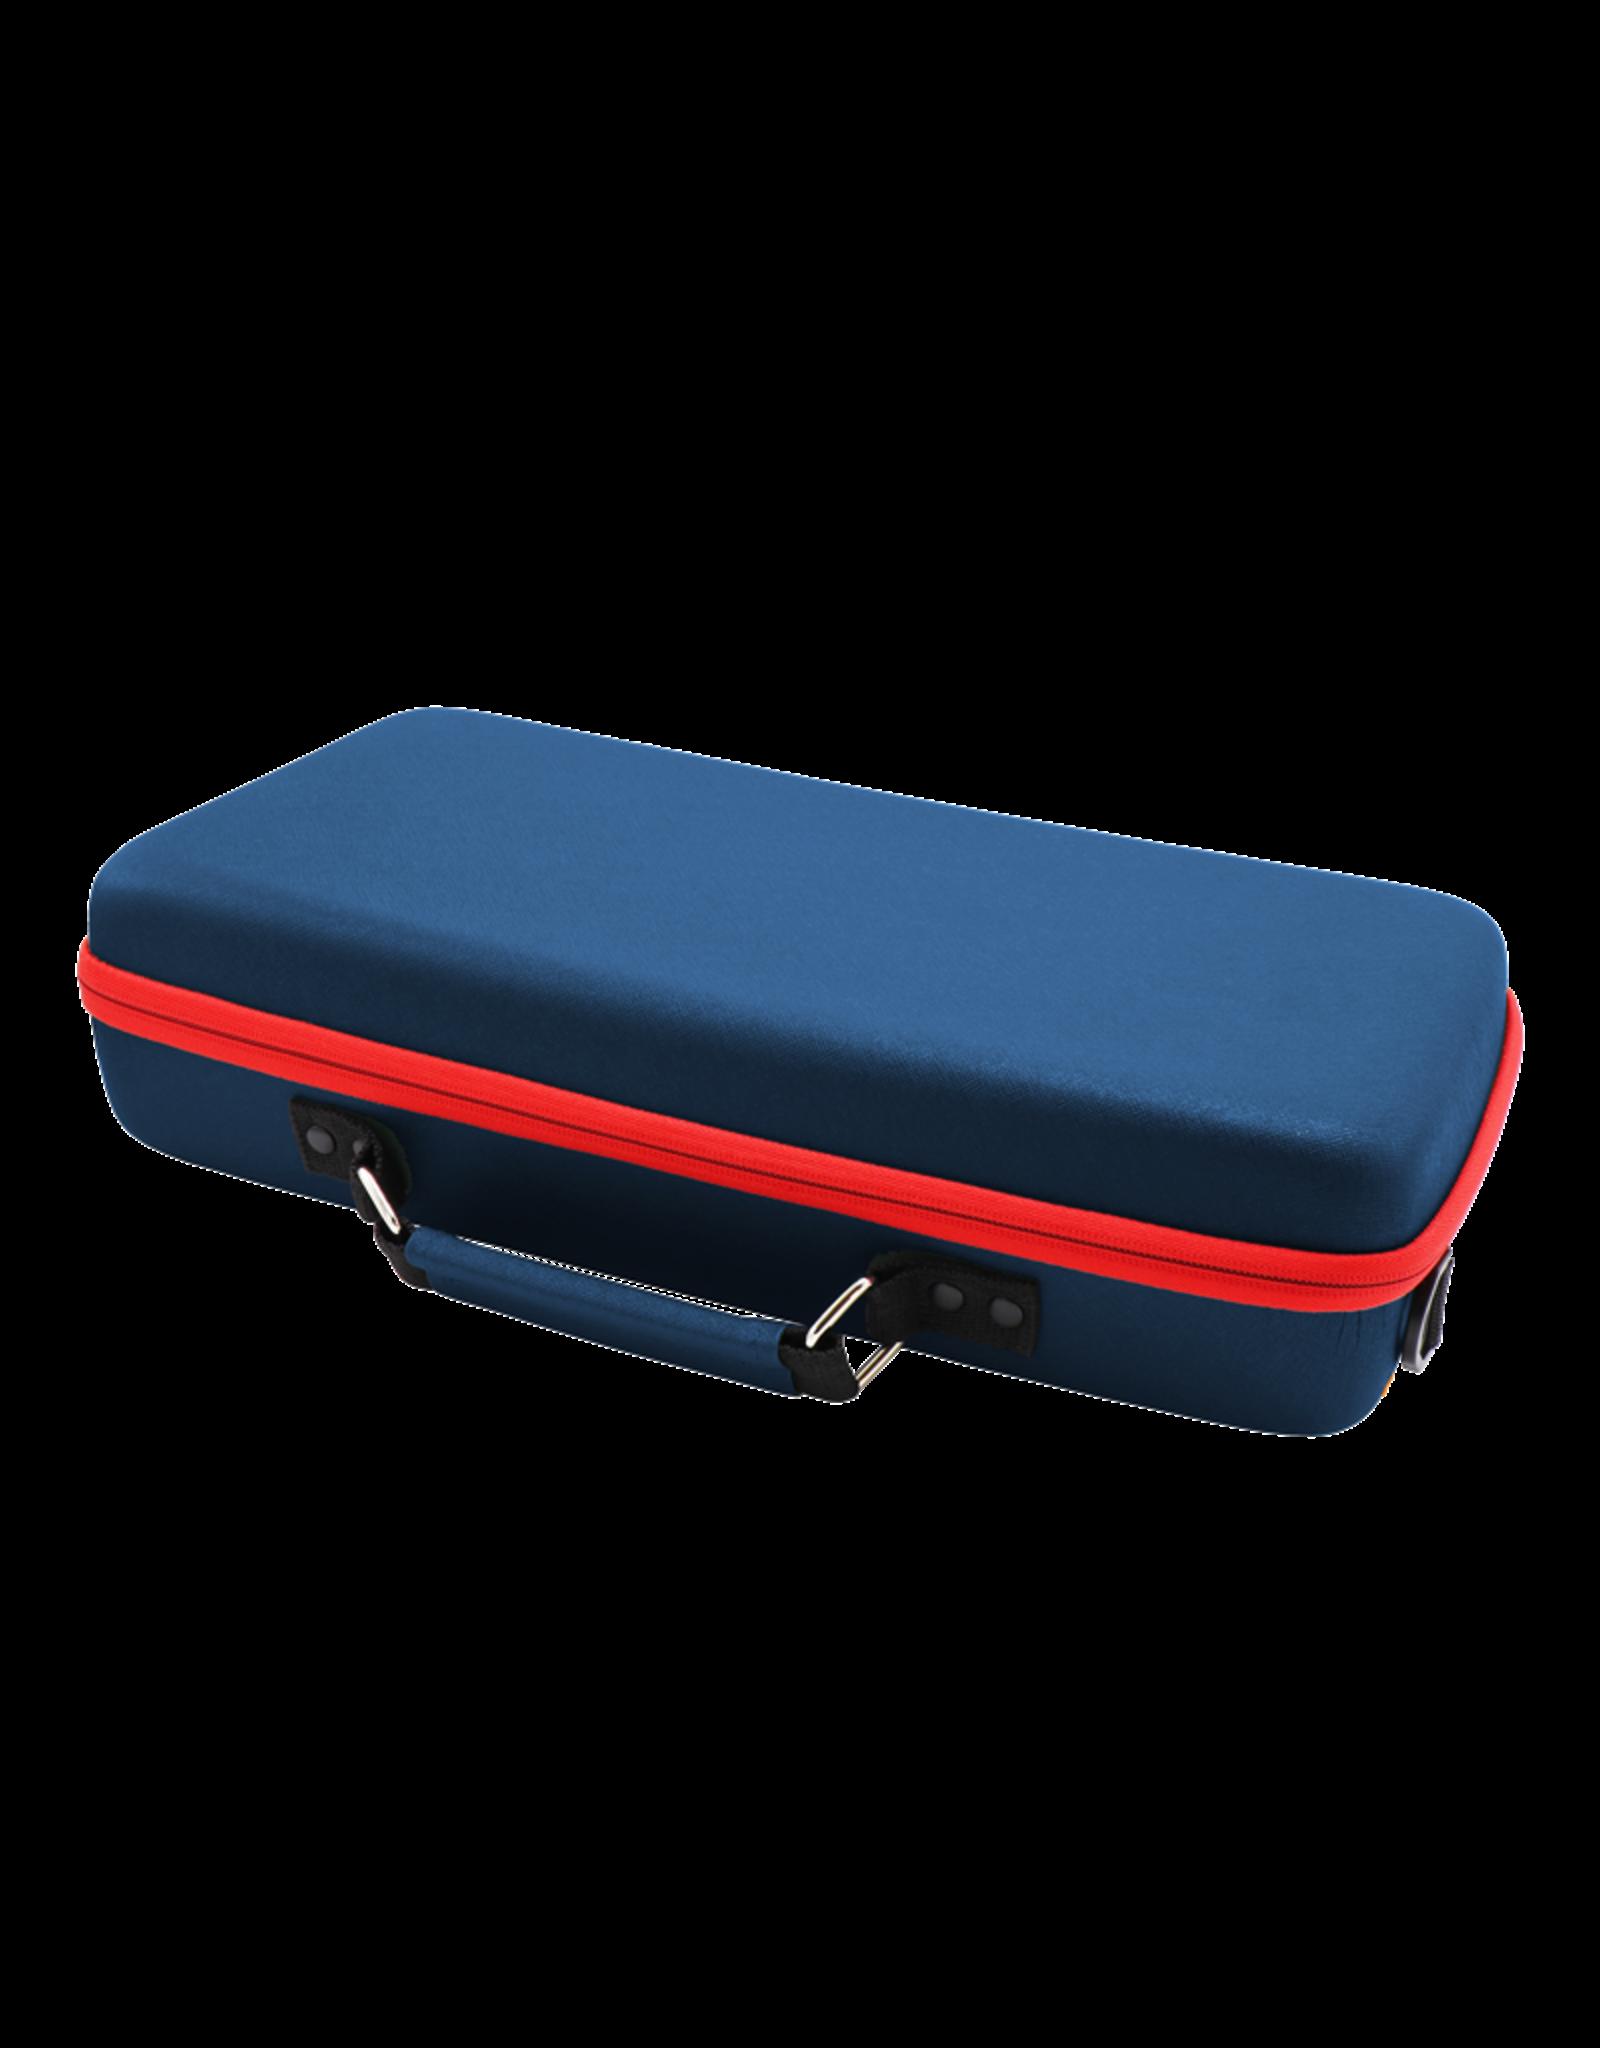 Dex Protection DEX Carrying Case Blue